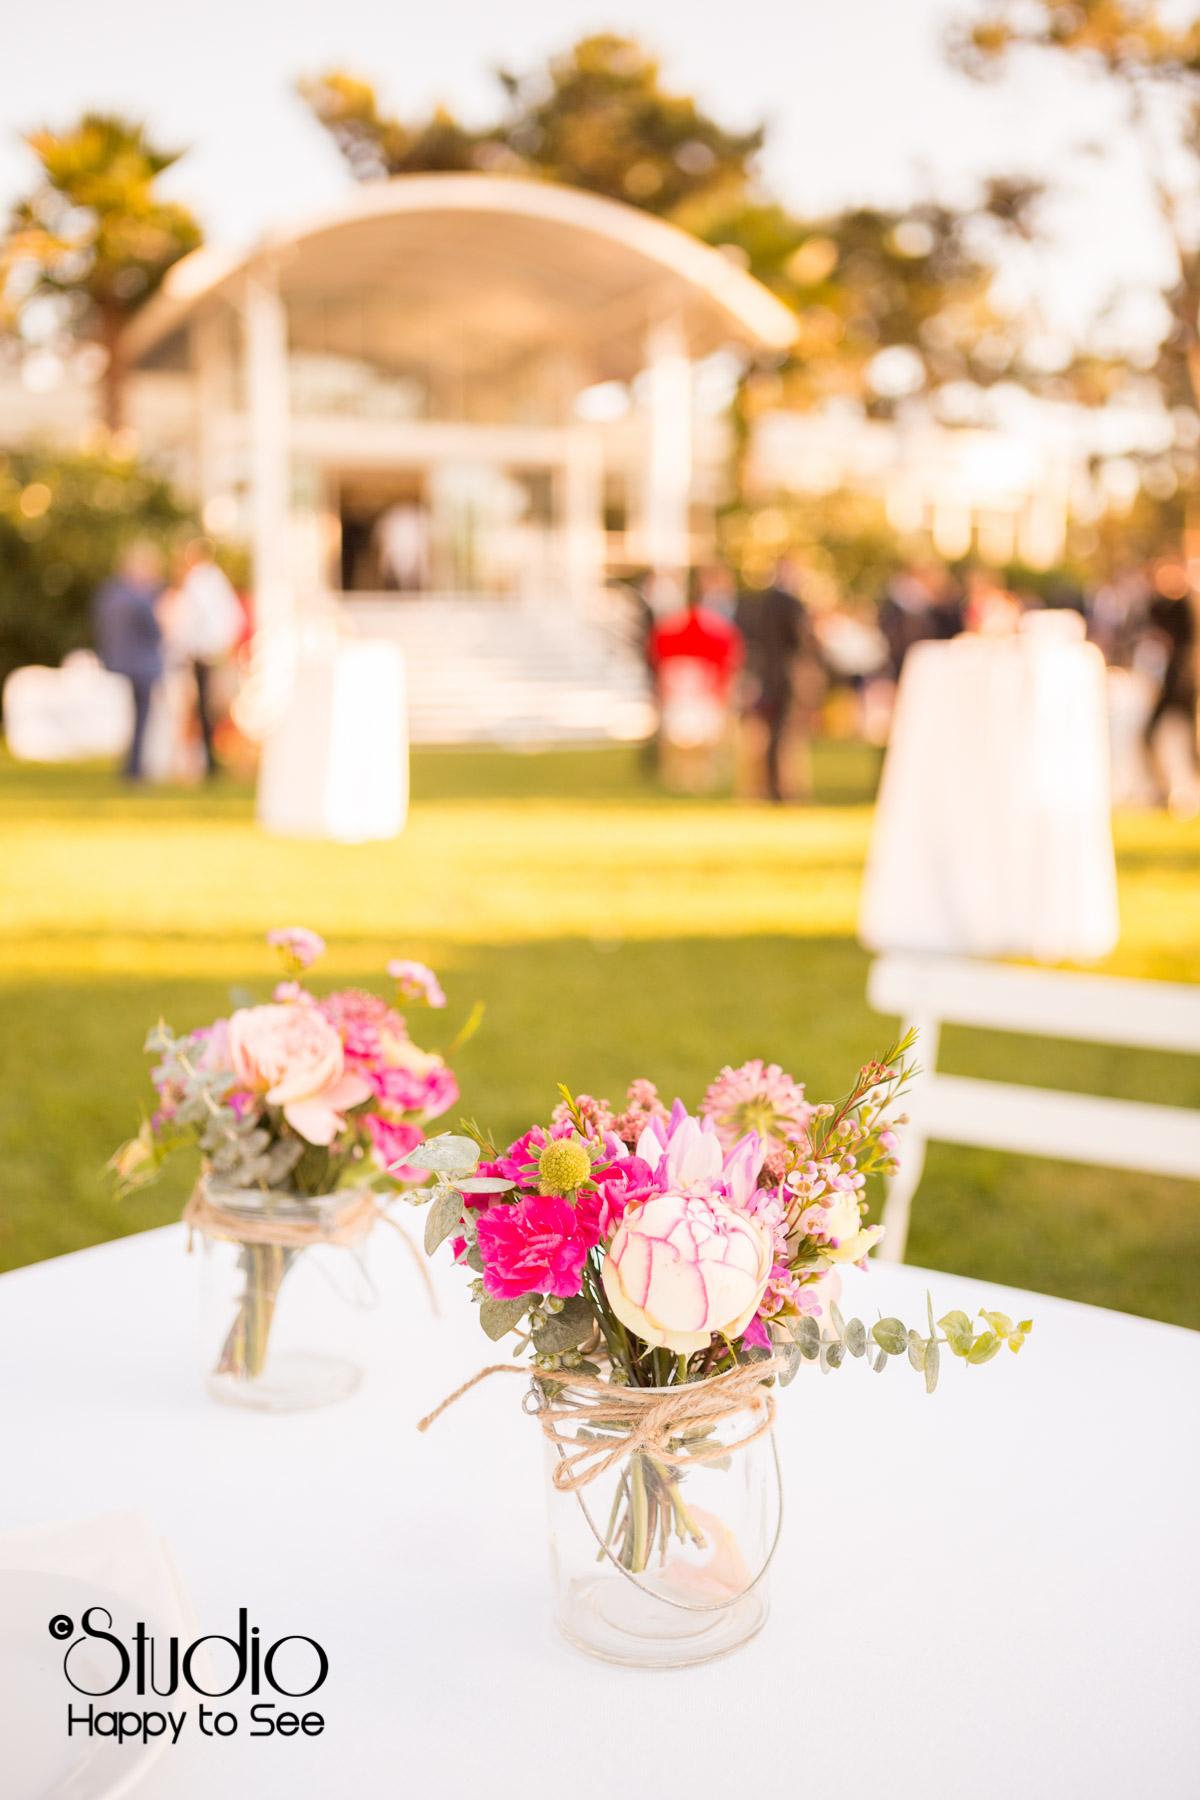 mariage salle au tir au vol arcachon decoration fleurs